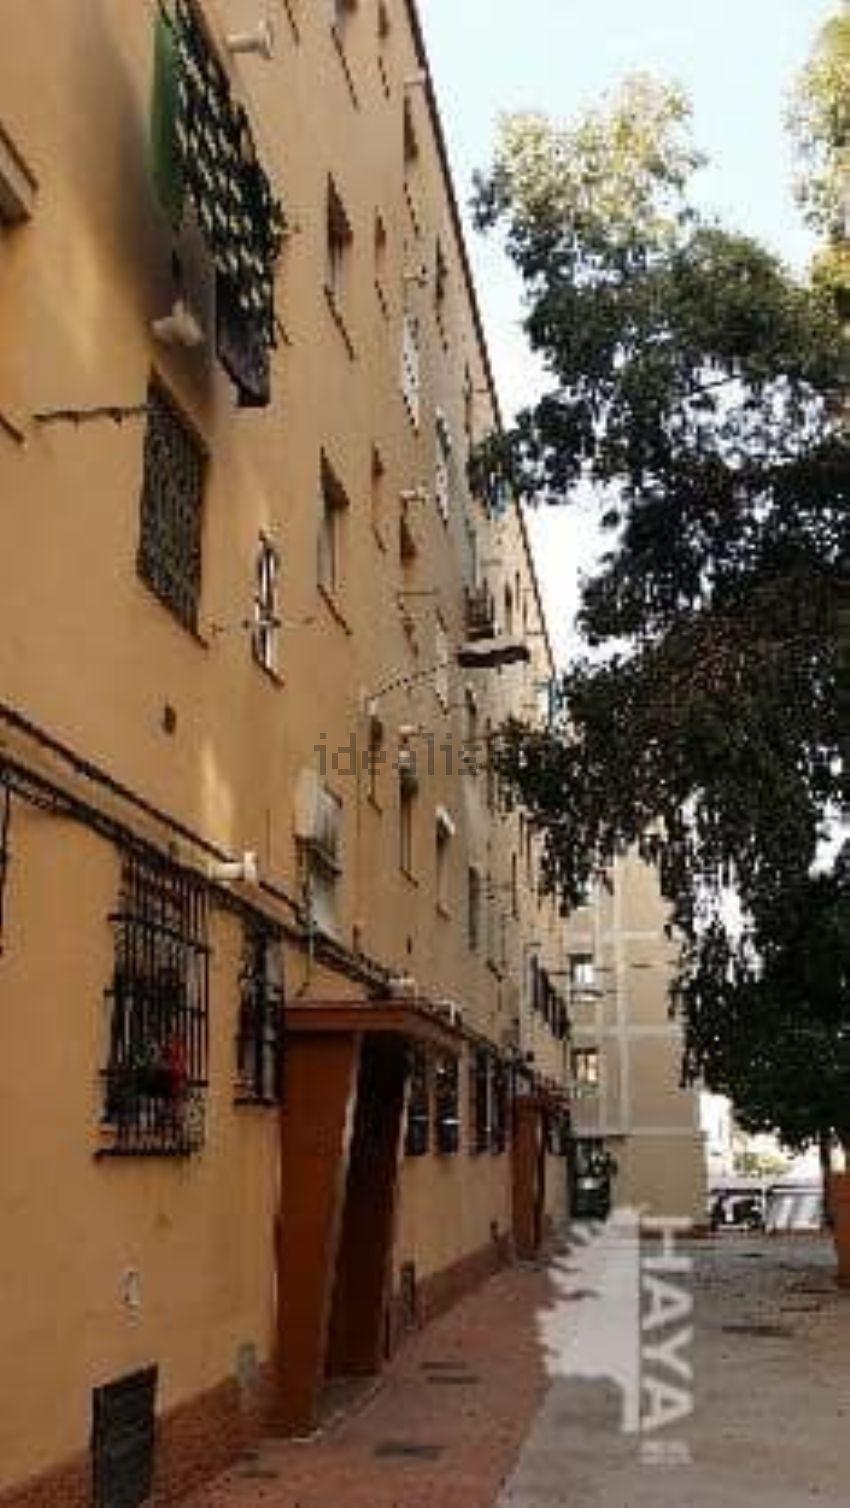 Piso en calle obispo juan de torres, 2, Mangas Verdes - Las Flores, Málaga